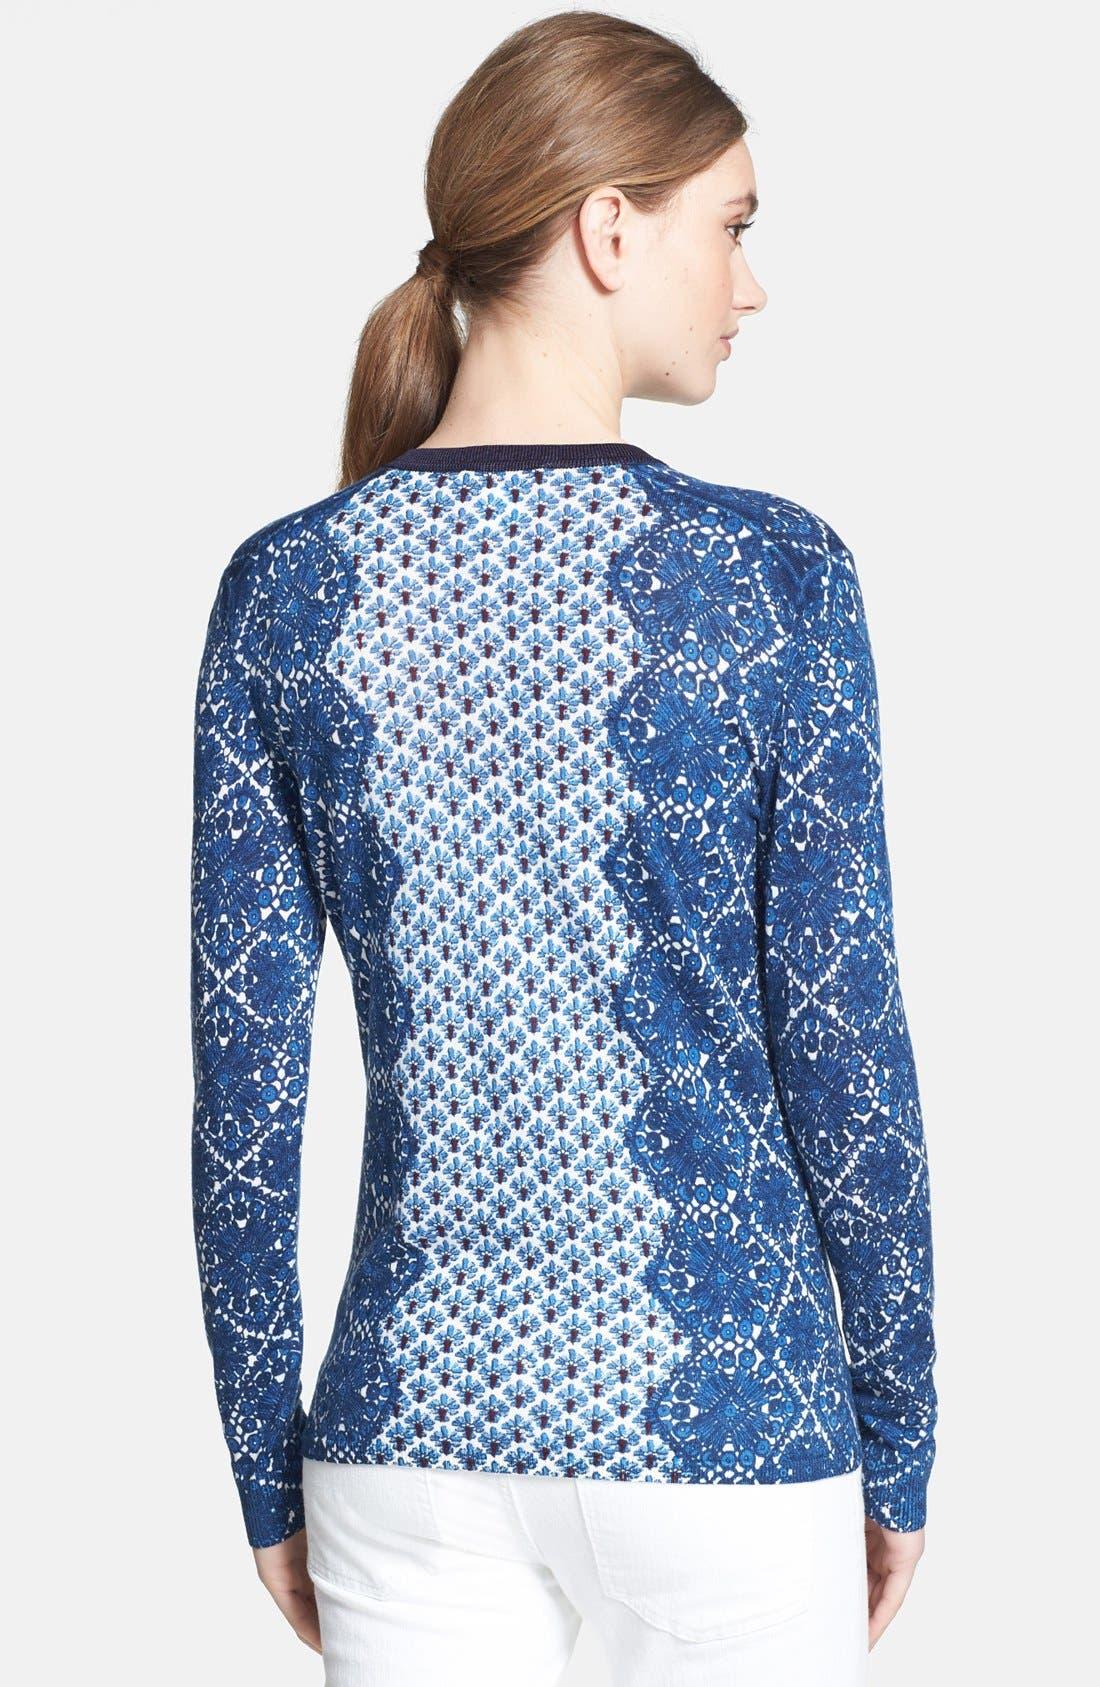 Alternate Image 2  - Tory Burch 'Diana' Print Merino Wool Cardigan